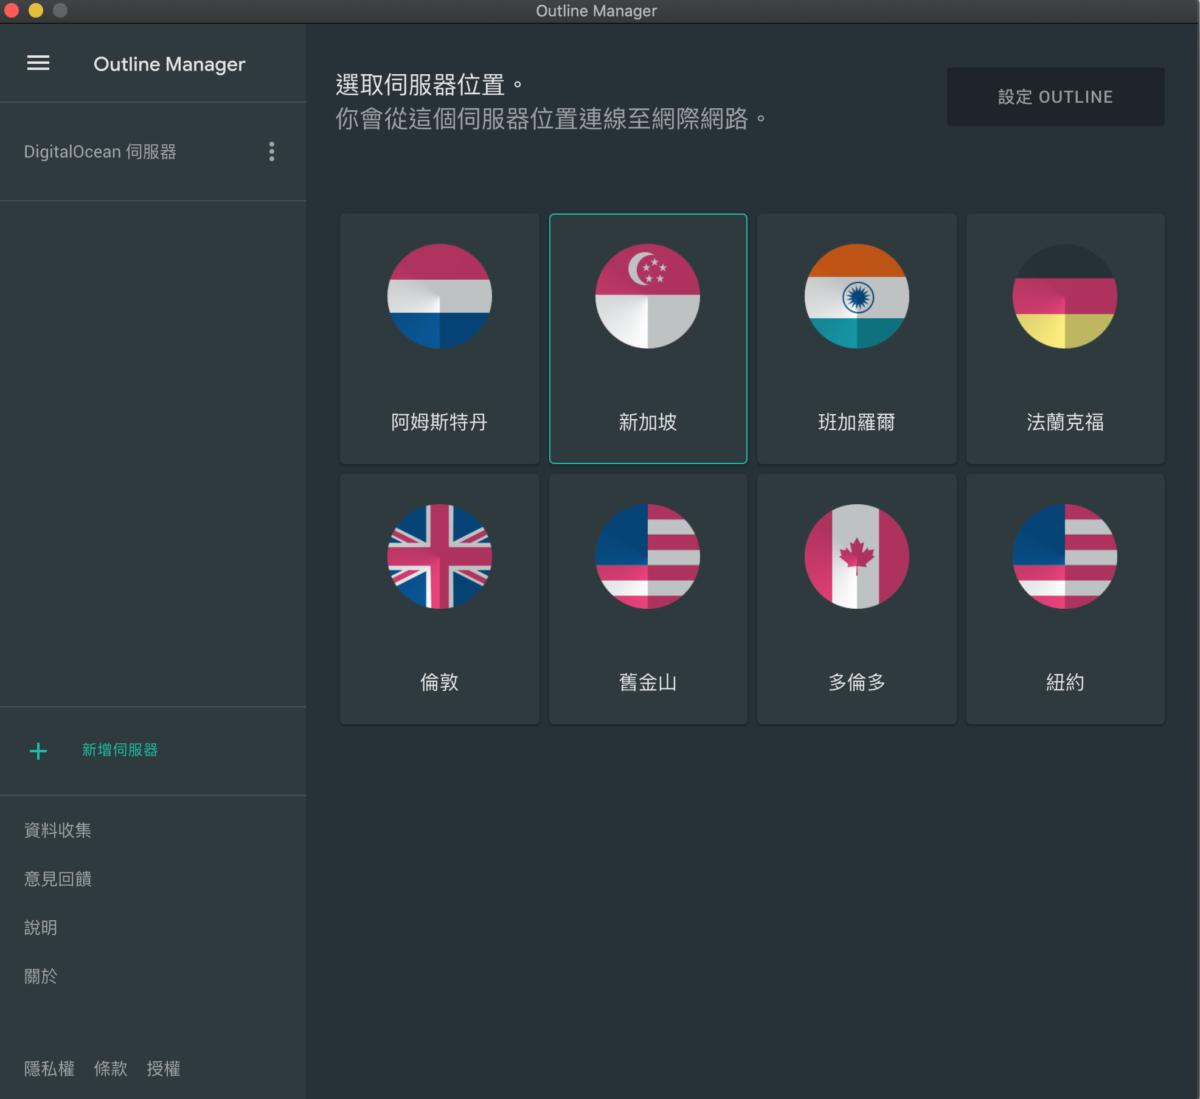 Step 6 回到《 Outline Manager 》就可選擇要建立 VPN 服務的國家,理論上從香港連線的話,選新加坡會是最快,不過曾經有其他用戶表示,選擇新加坡的話會不穩定,所以最好還是選擇三藩市(舊金山)或紐約。